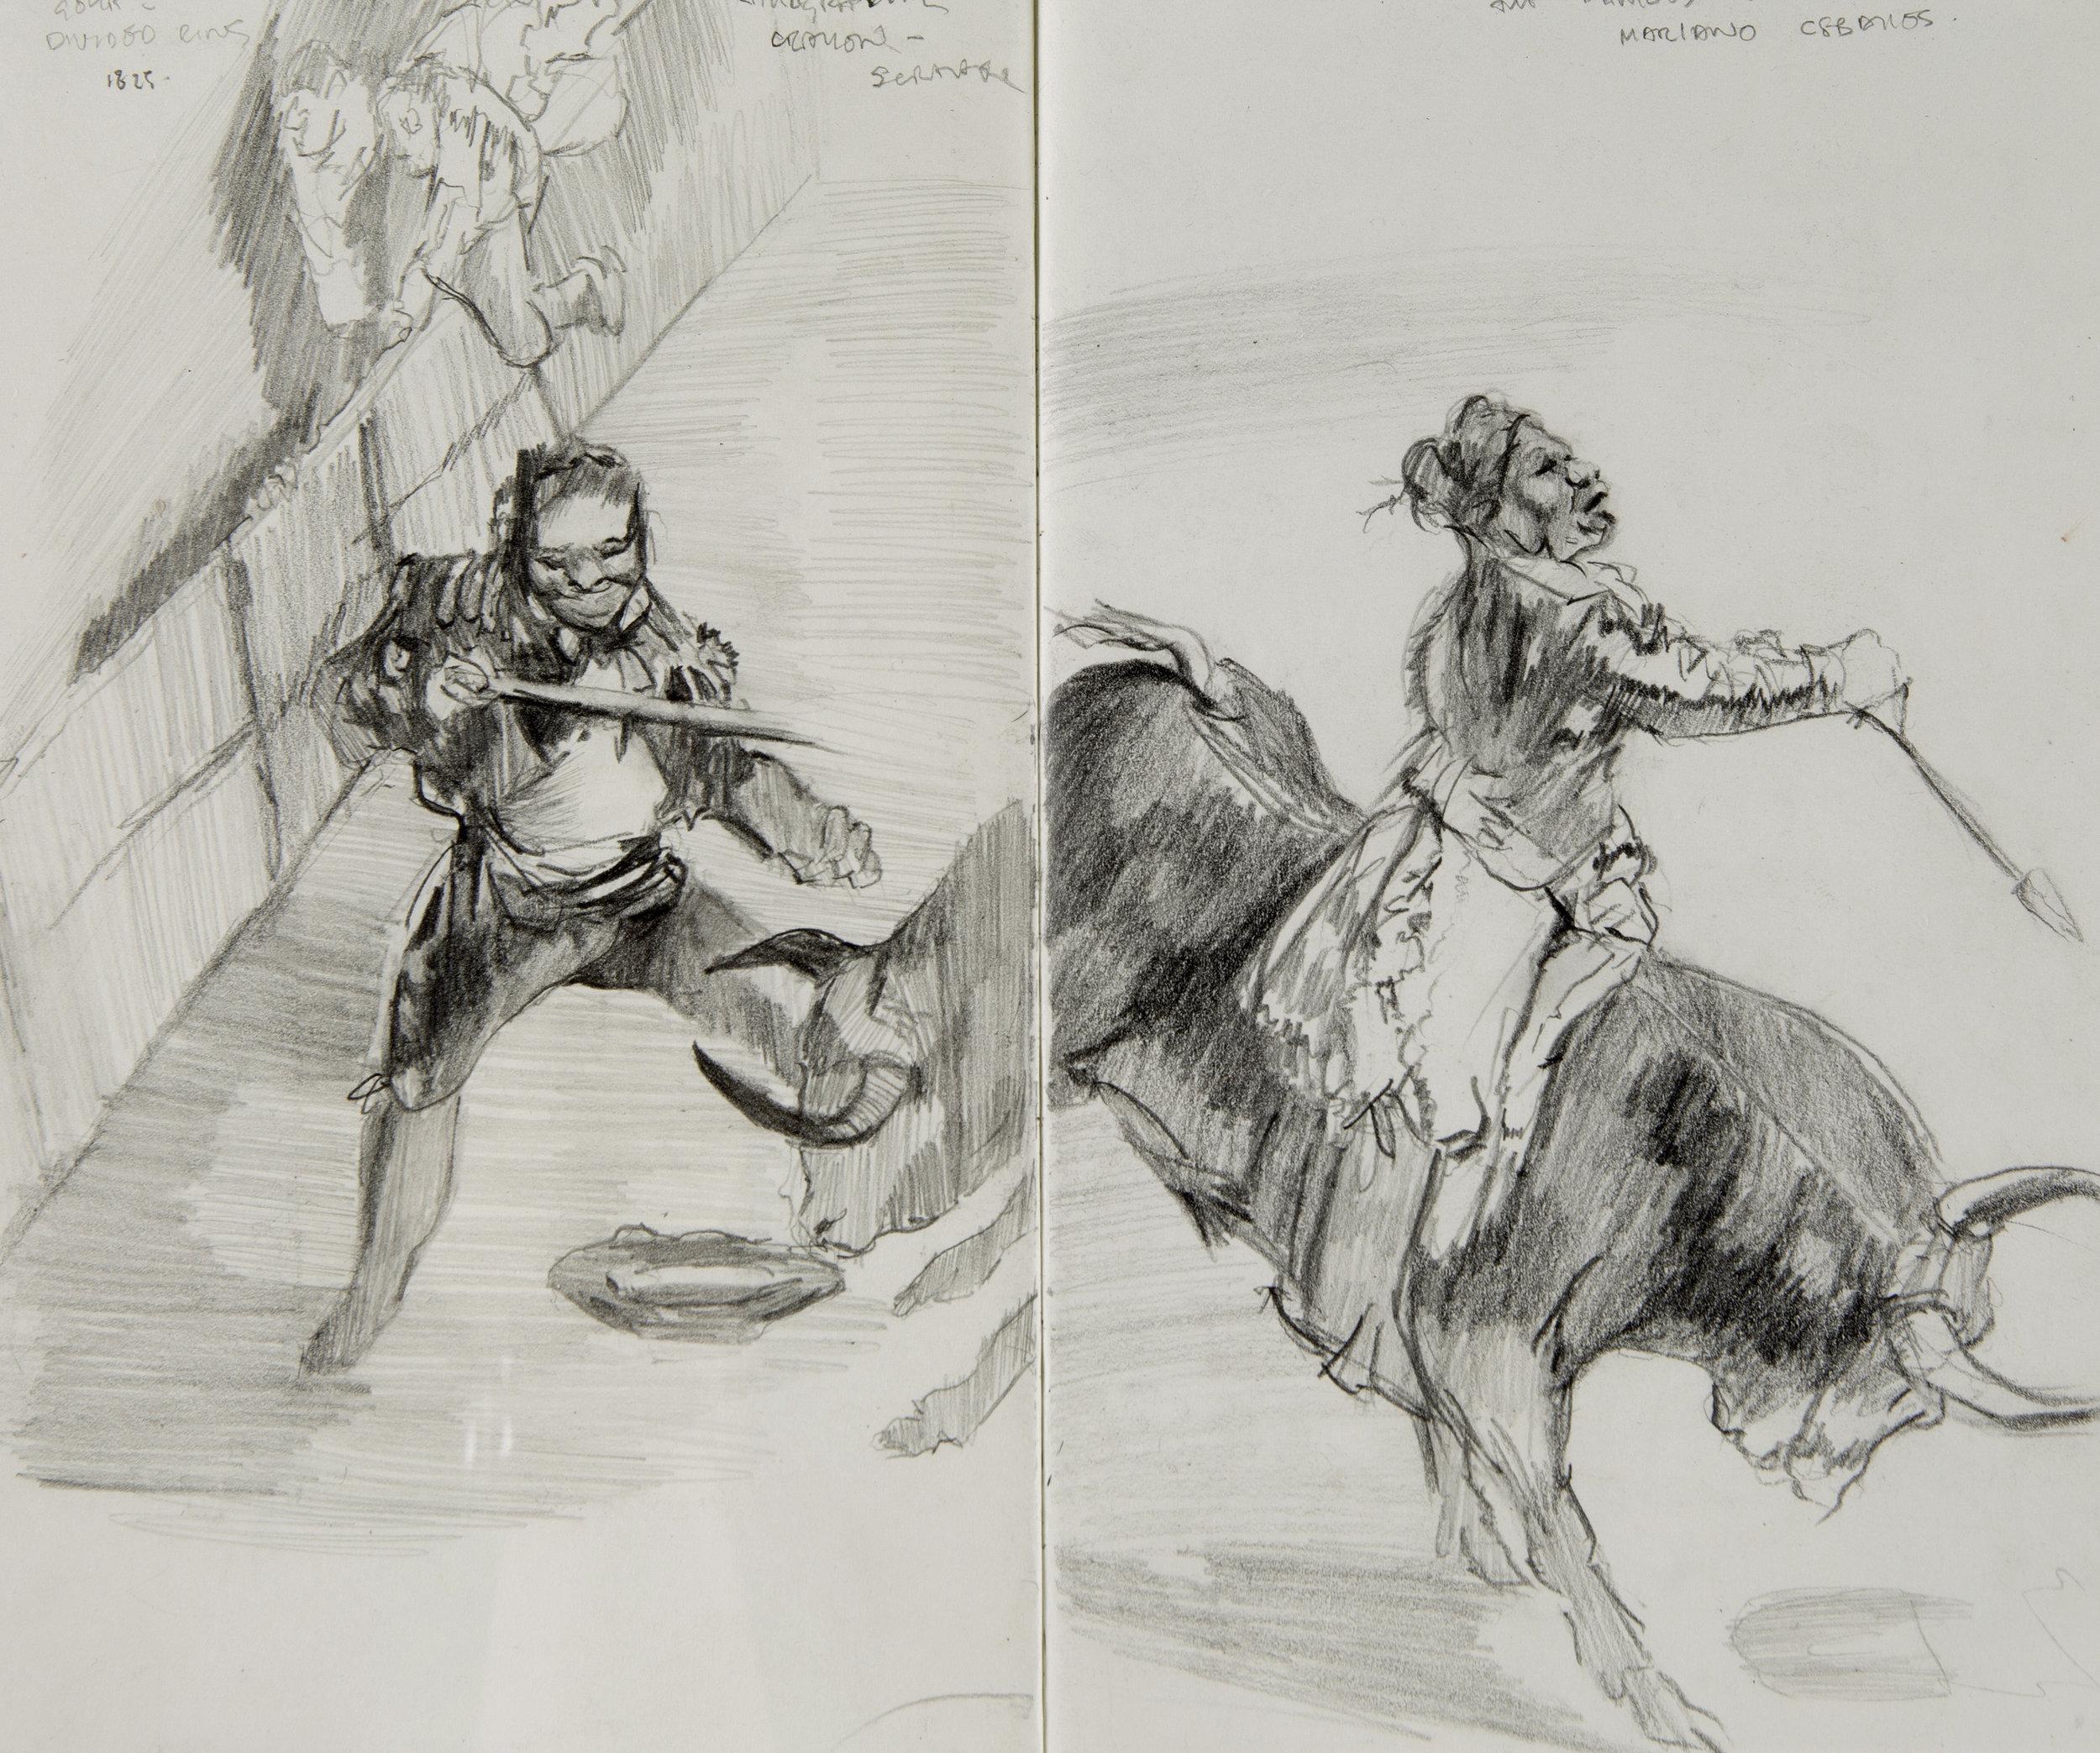 Sketchbook studies after 'La Tauromaquia,' 1816, Francisco de Goya